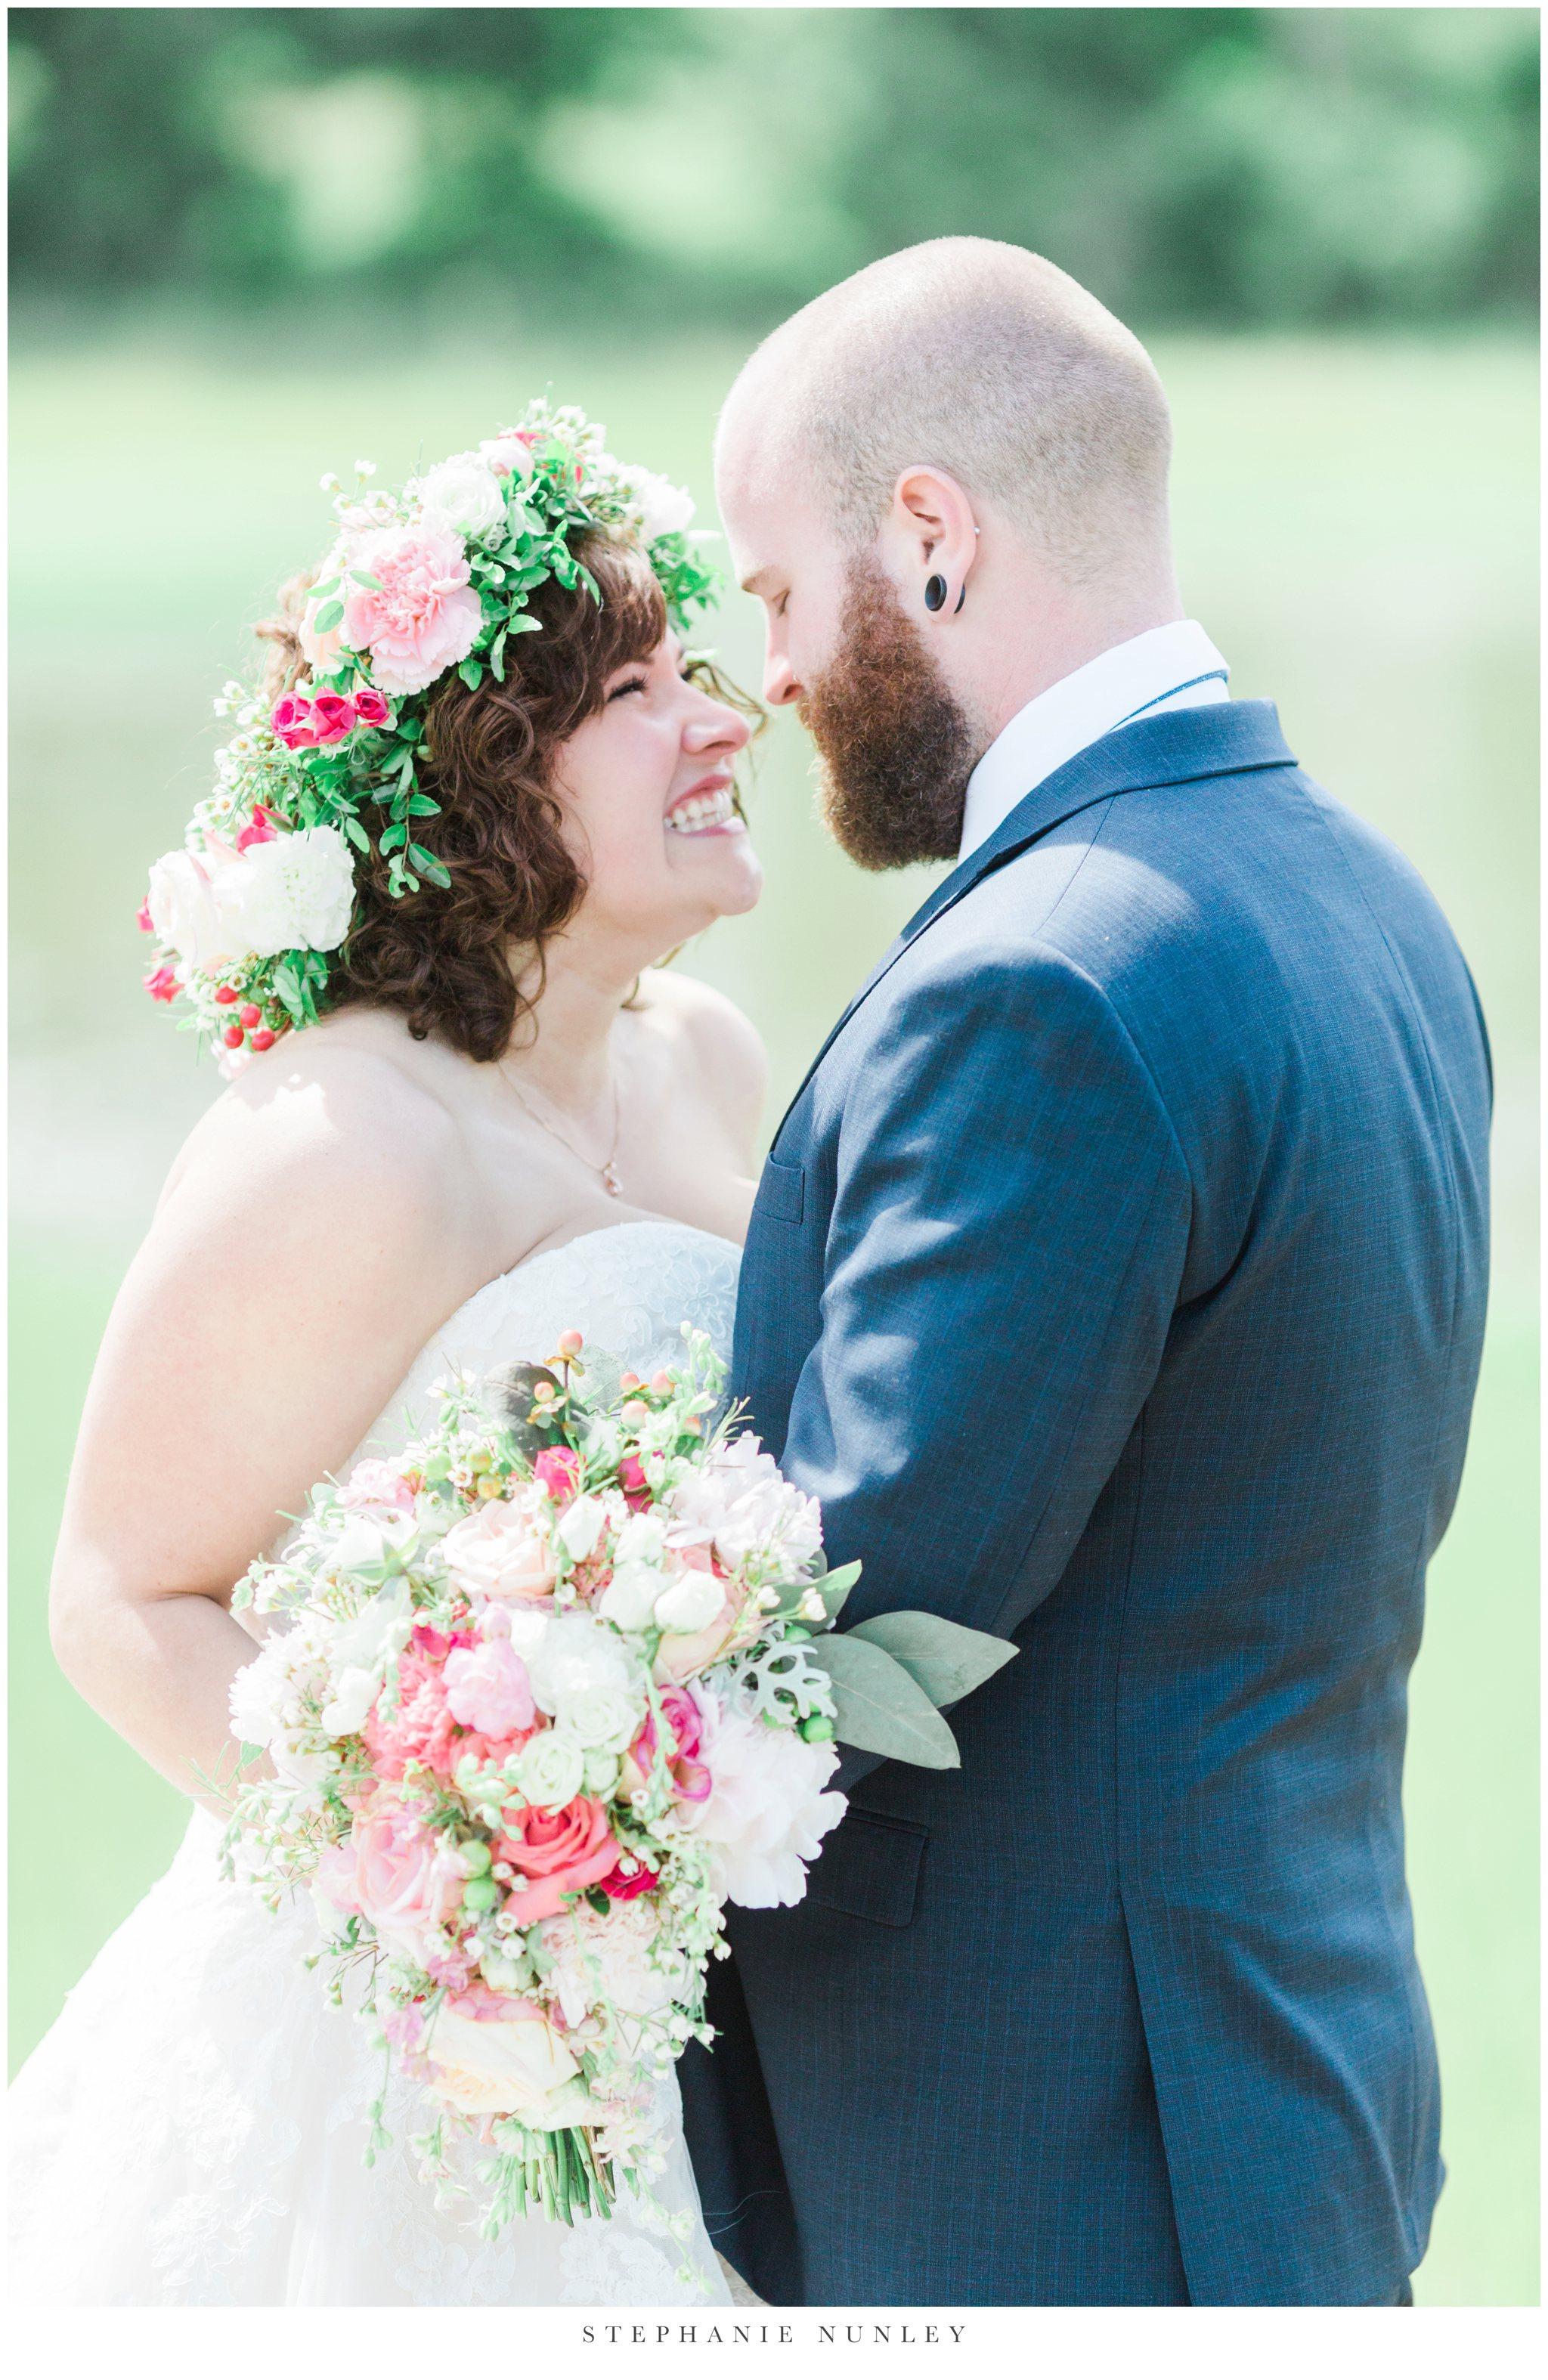 romantic-outdoor-wedding-with-flower-crown-0061.jpg